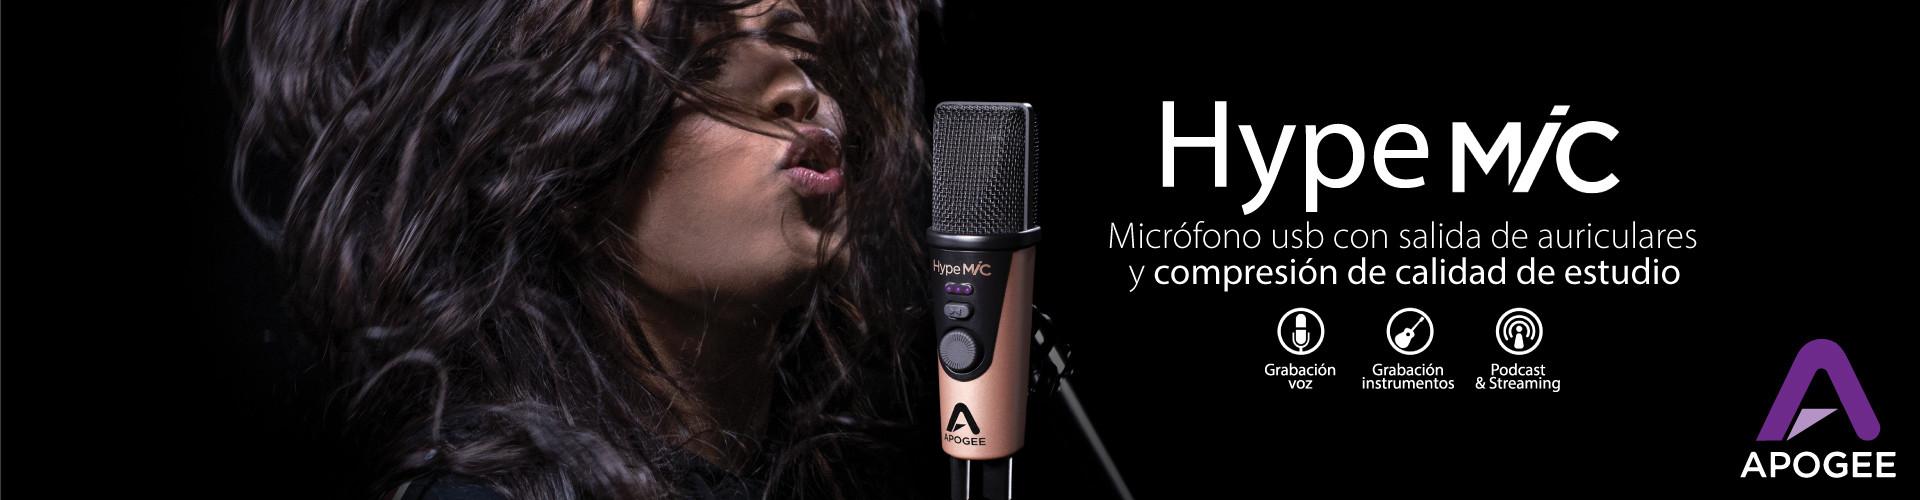 Micrófono usb Apogee Hype Mic